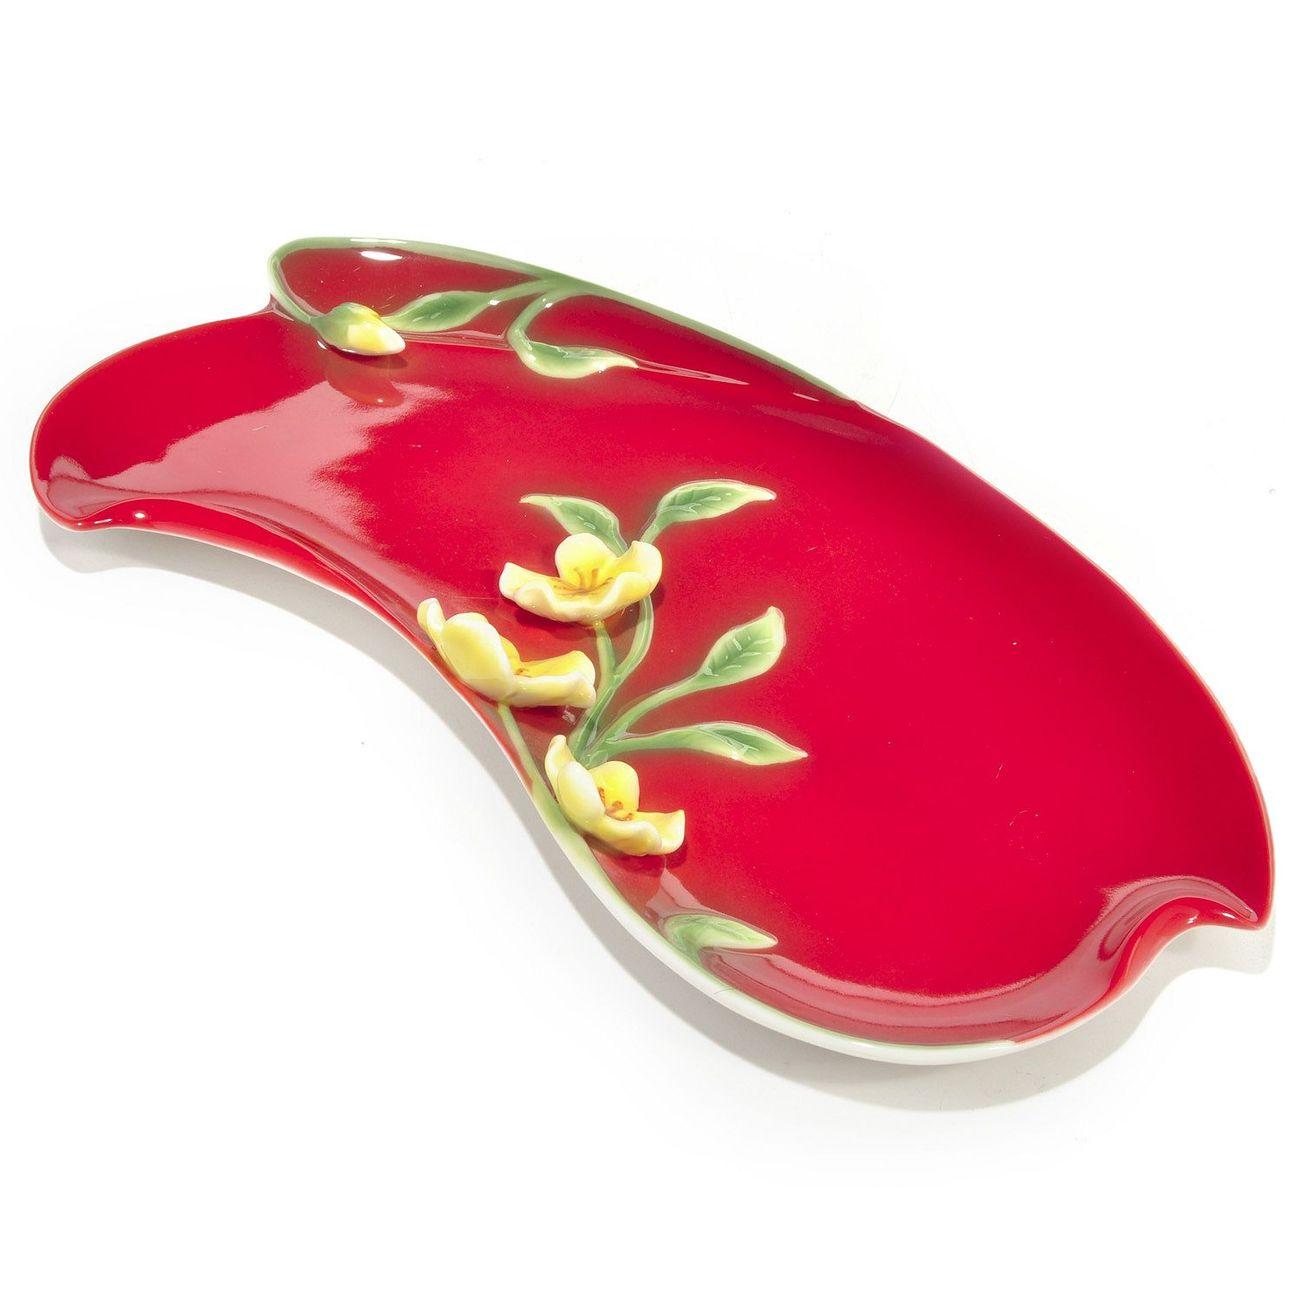 Manchu rose service plate